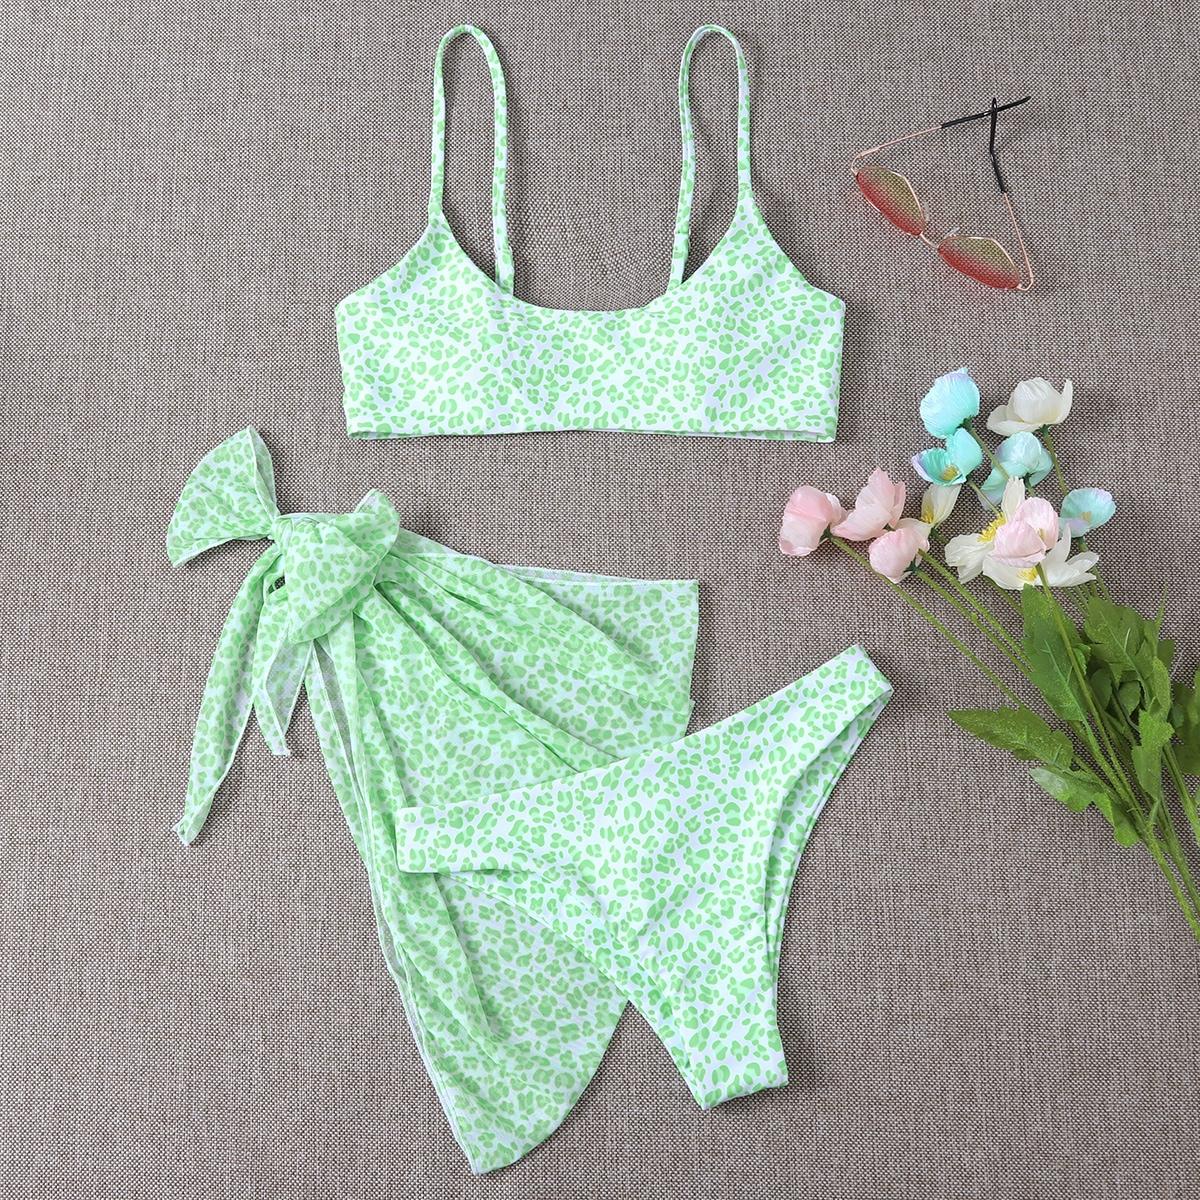 SHEIN / 3pack Leopard Bikini Swimsuit & Beach Skirt